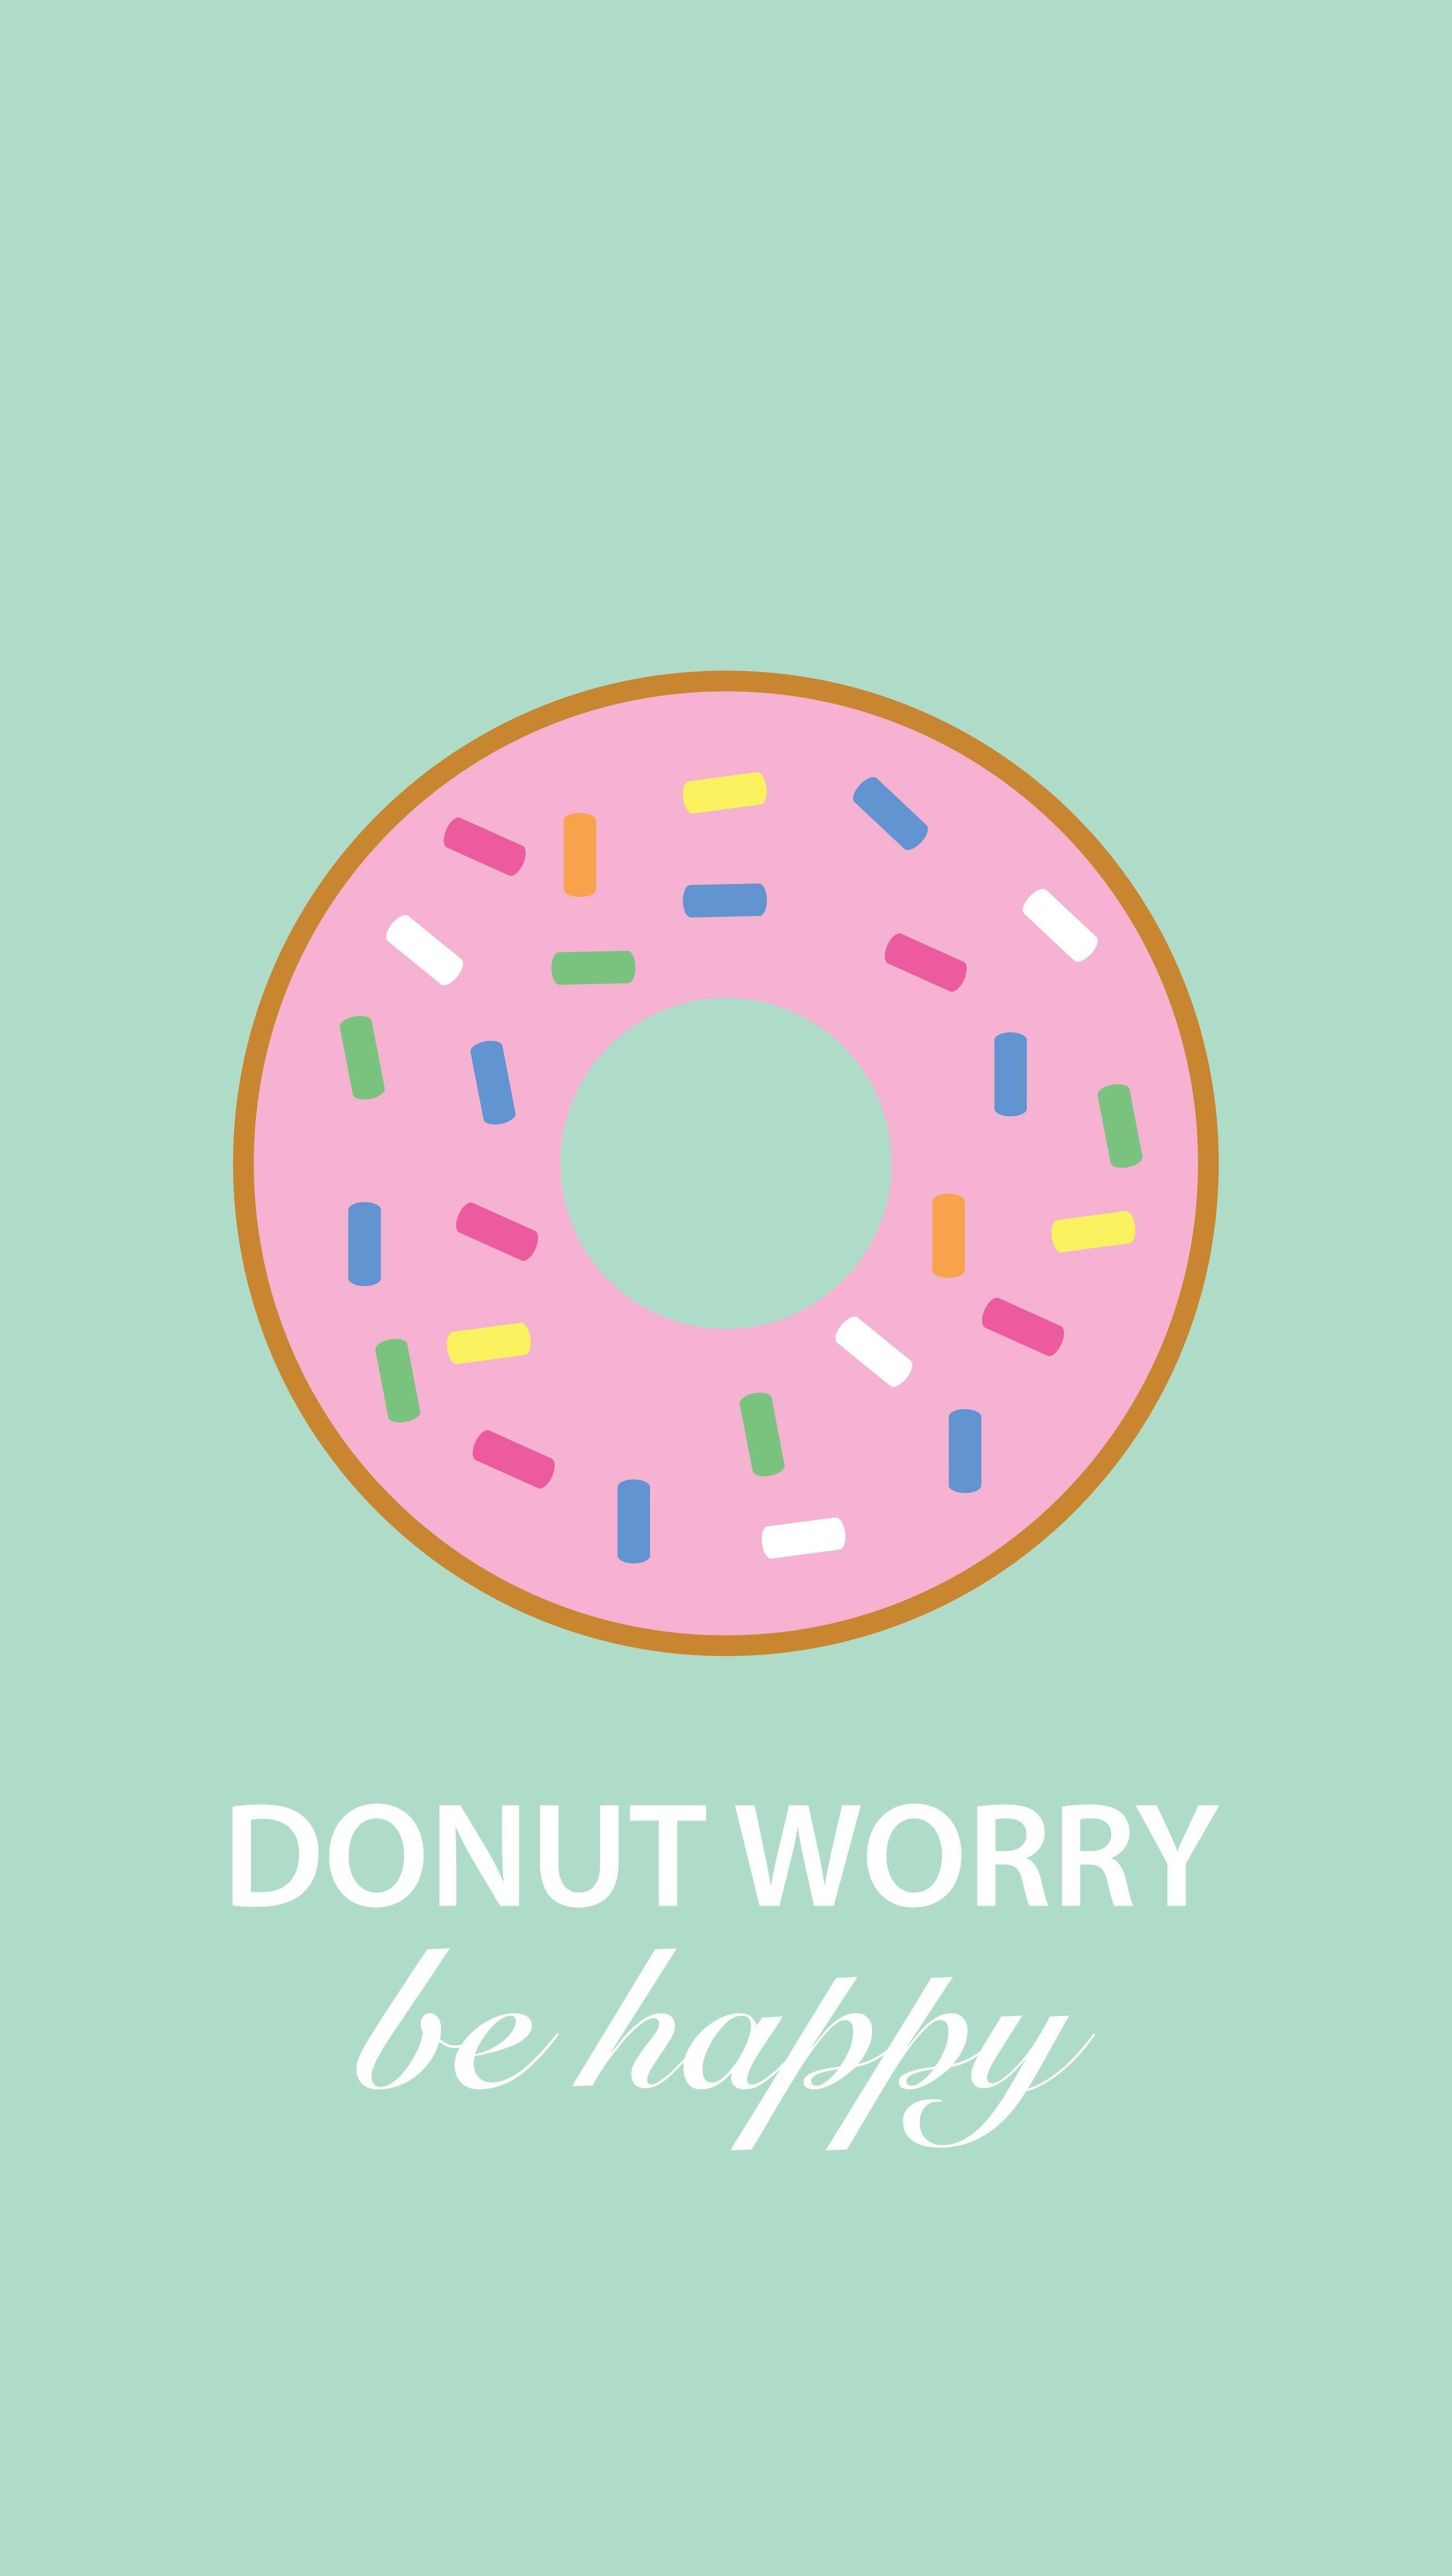 Doughnut worry be happy Fun in 2018 Pinterest